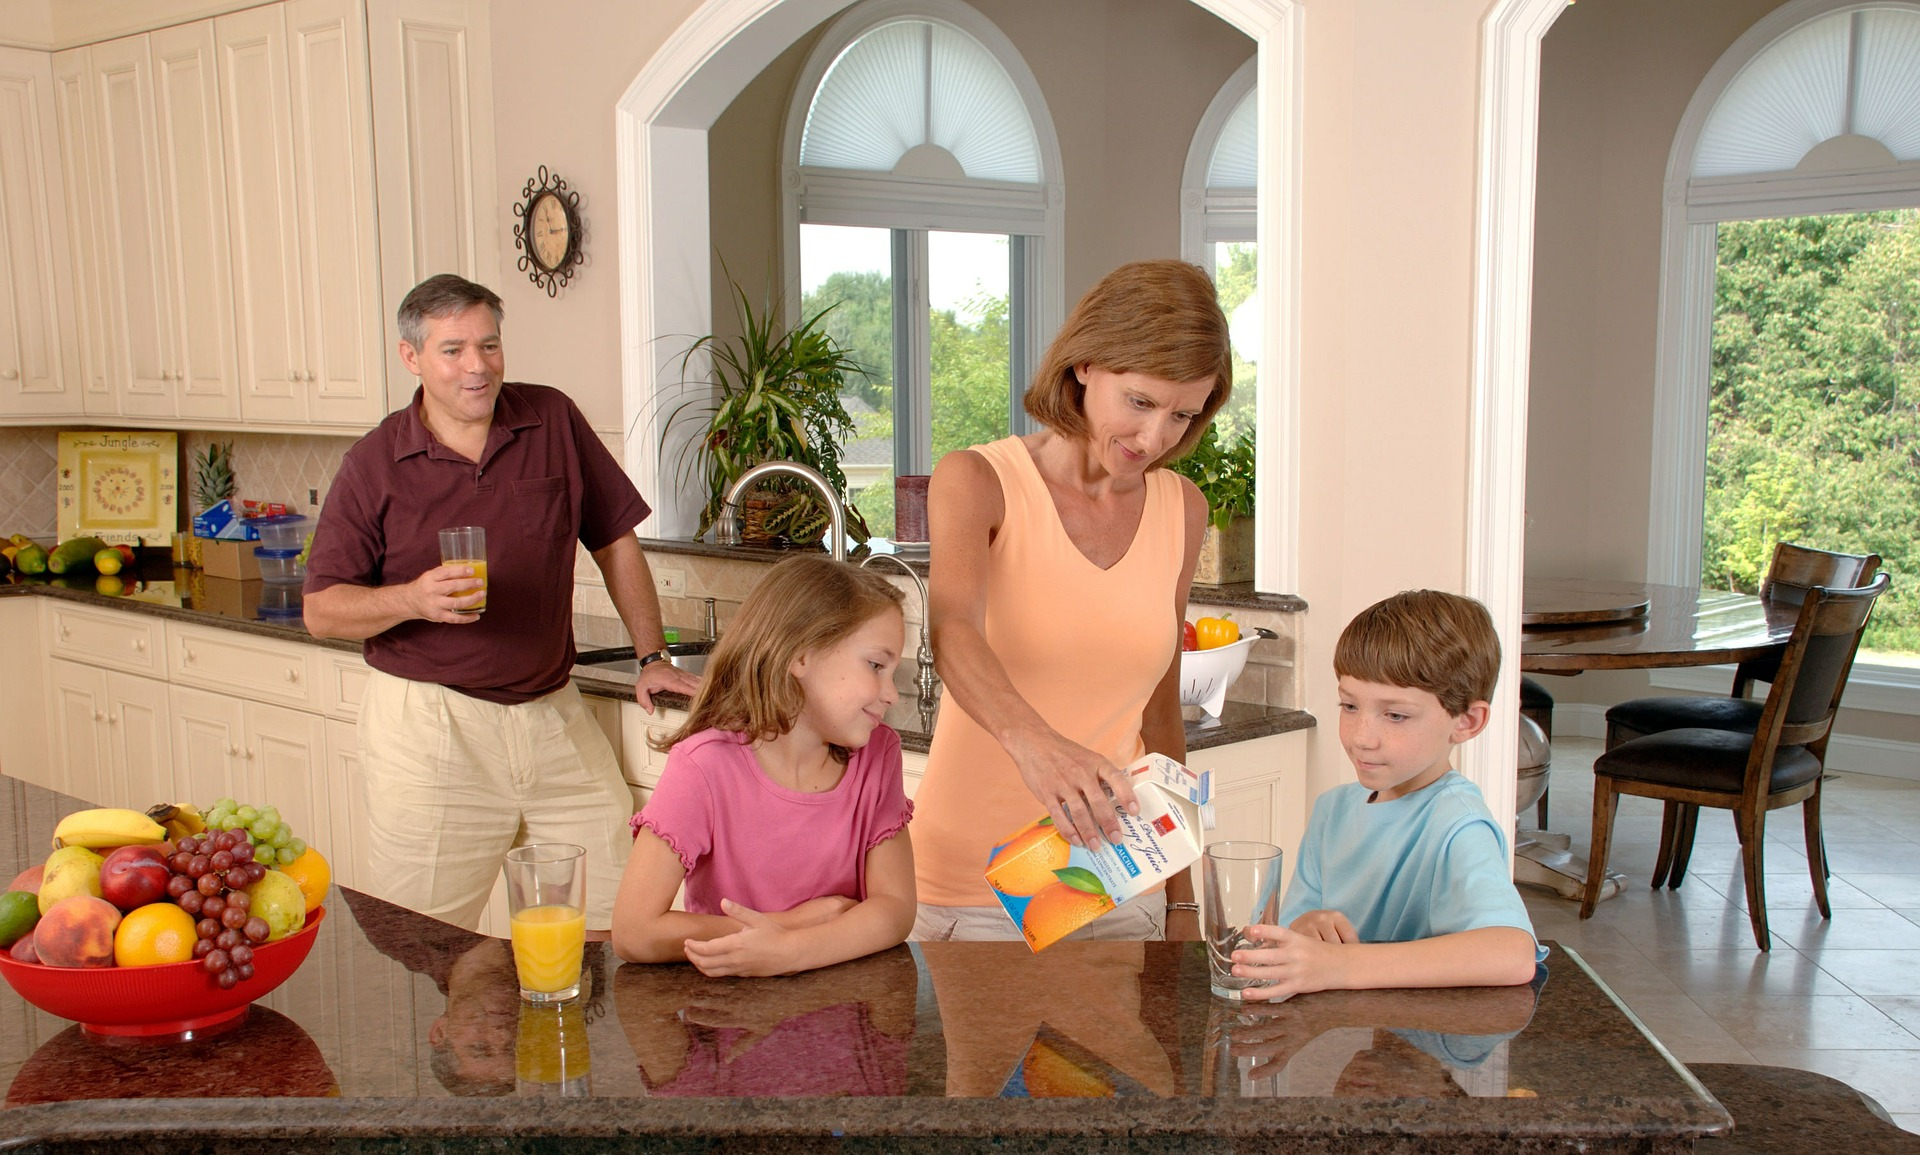 family-drinking-orange-juice-619144_1920